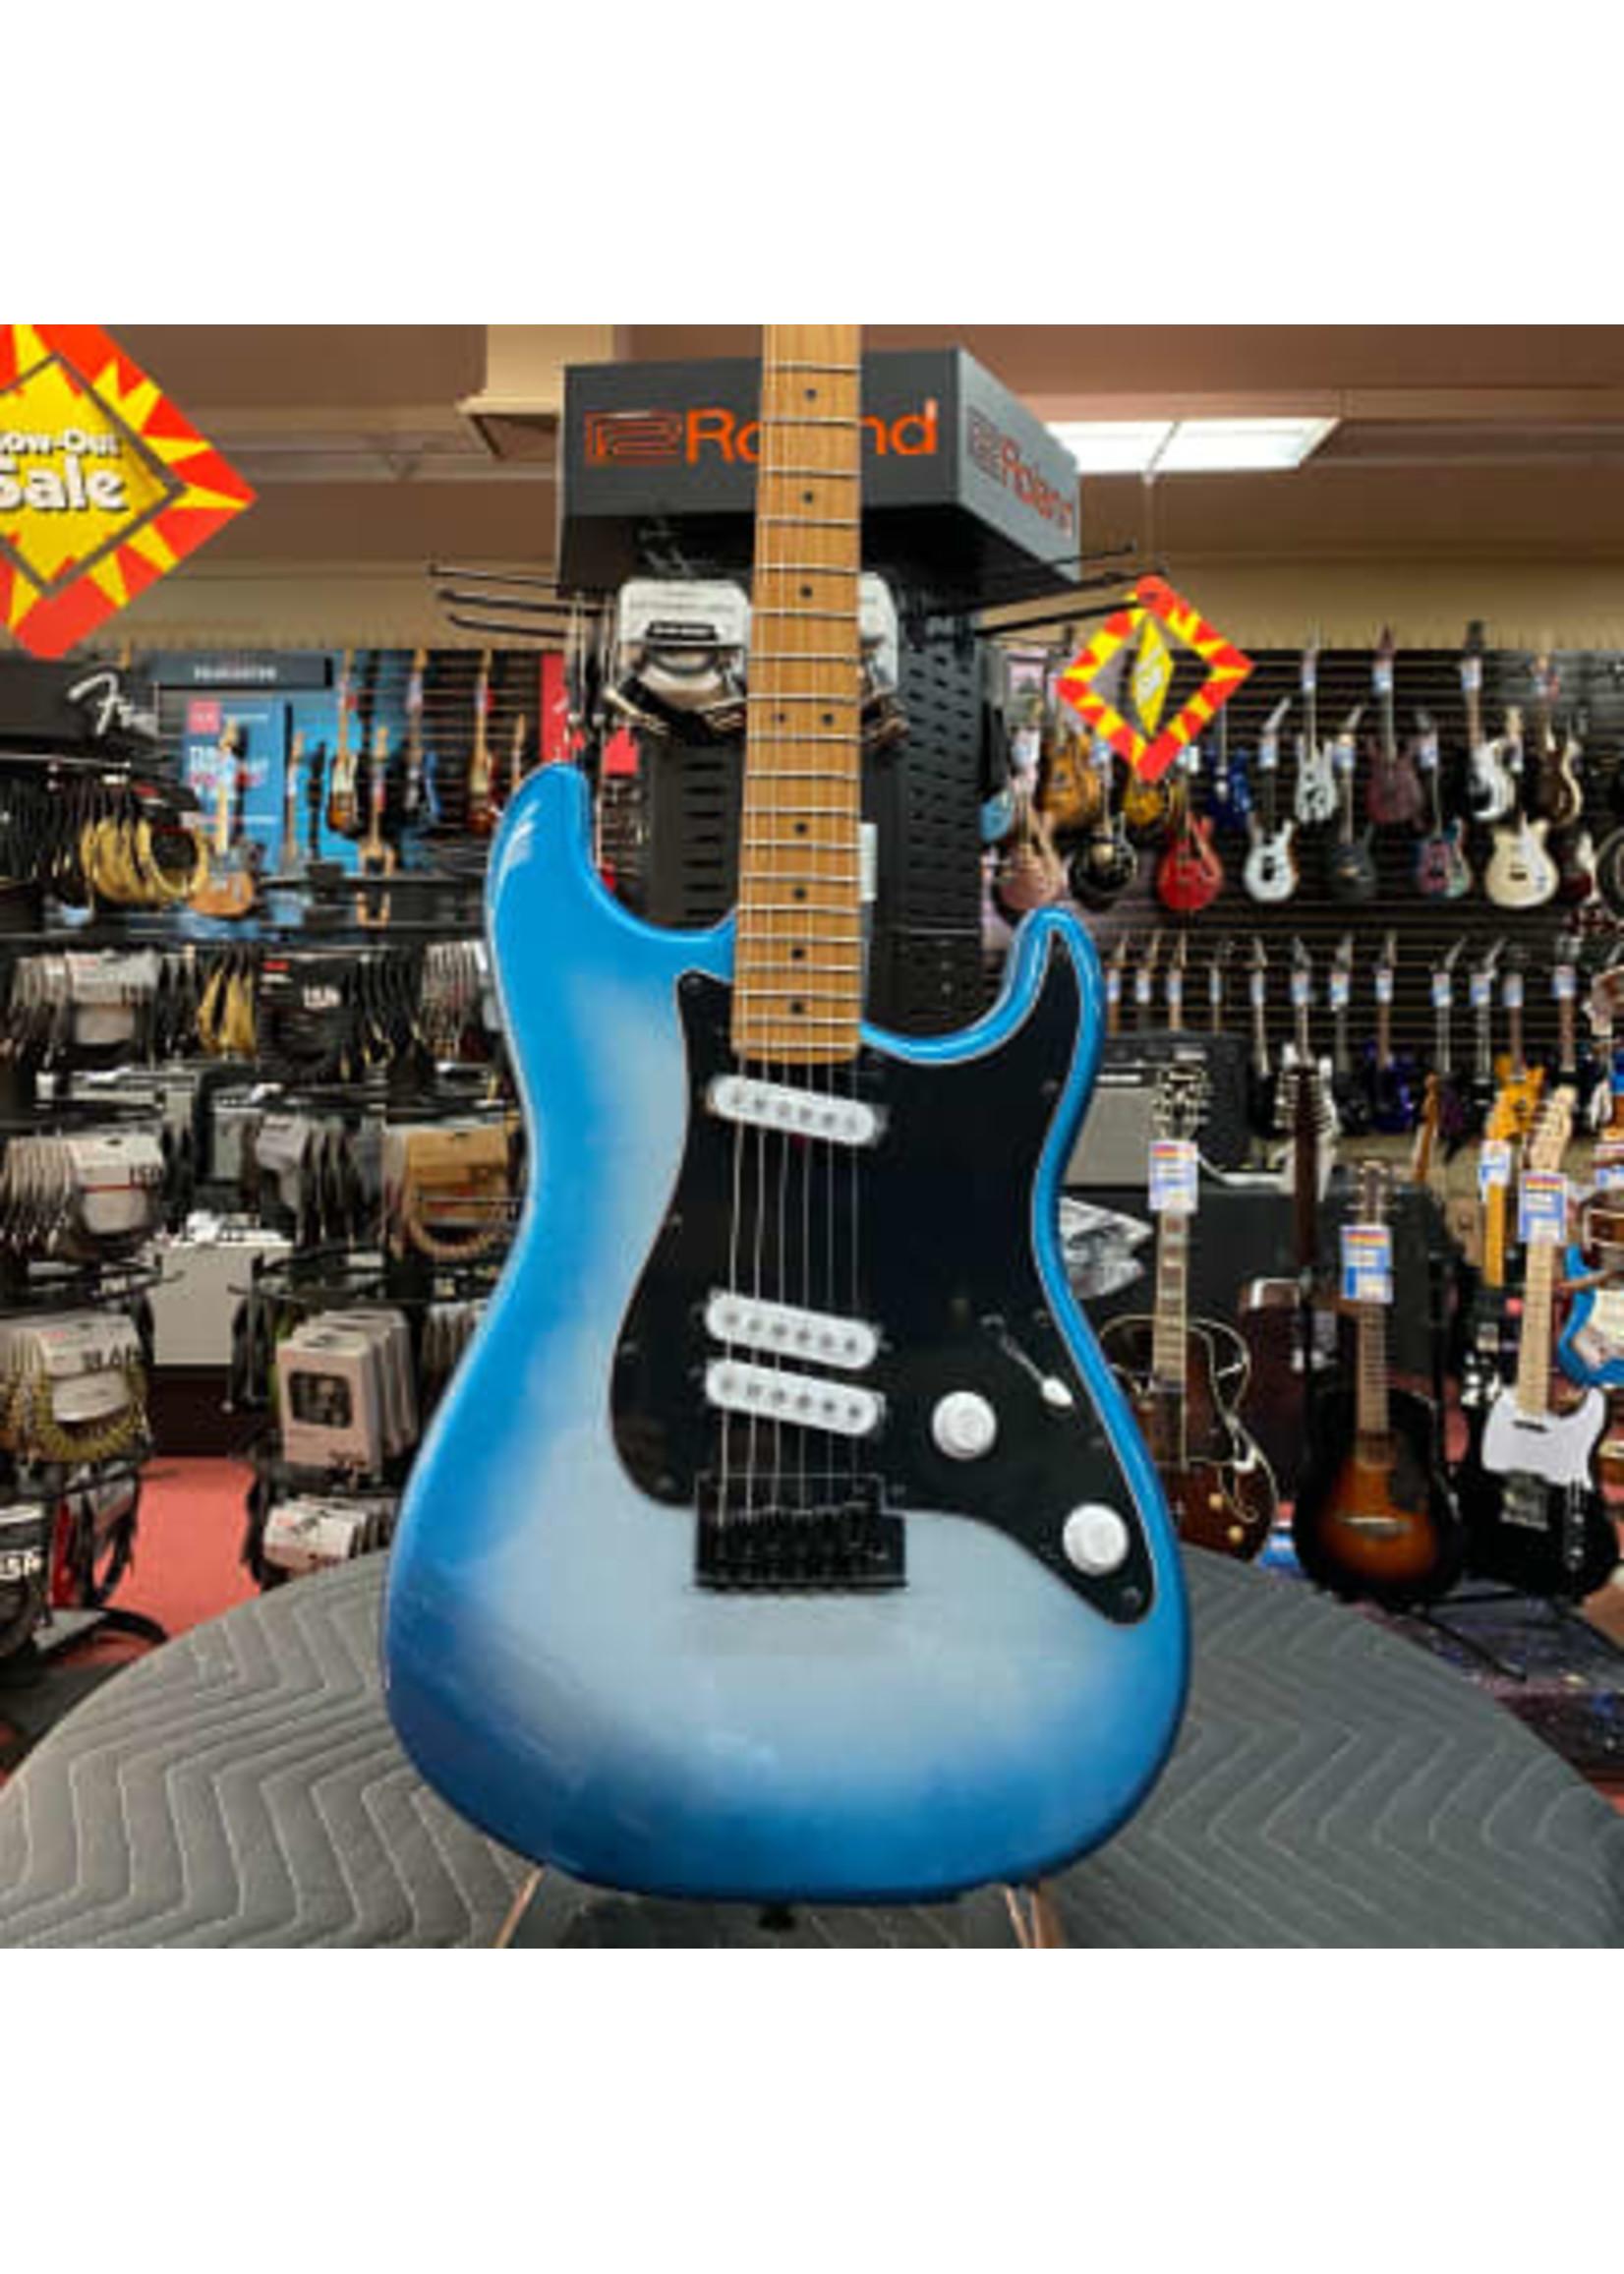 Squier Contemporary Stratocaster® Special, Roasted Maple Fingerboard, Black Pickguard, Sky Burst Metallic